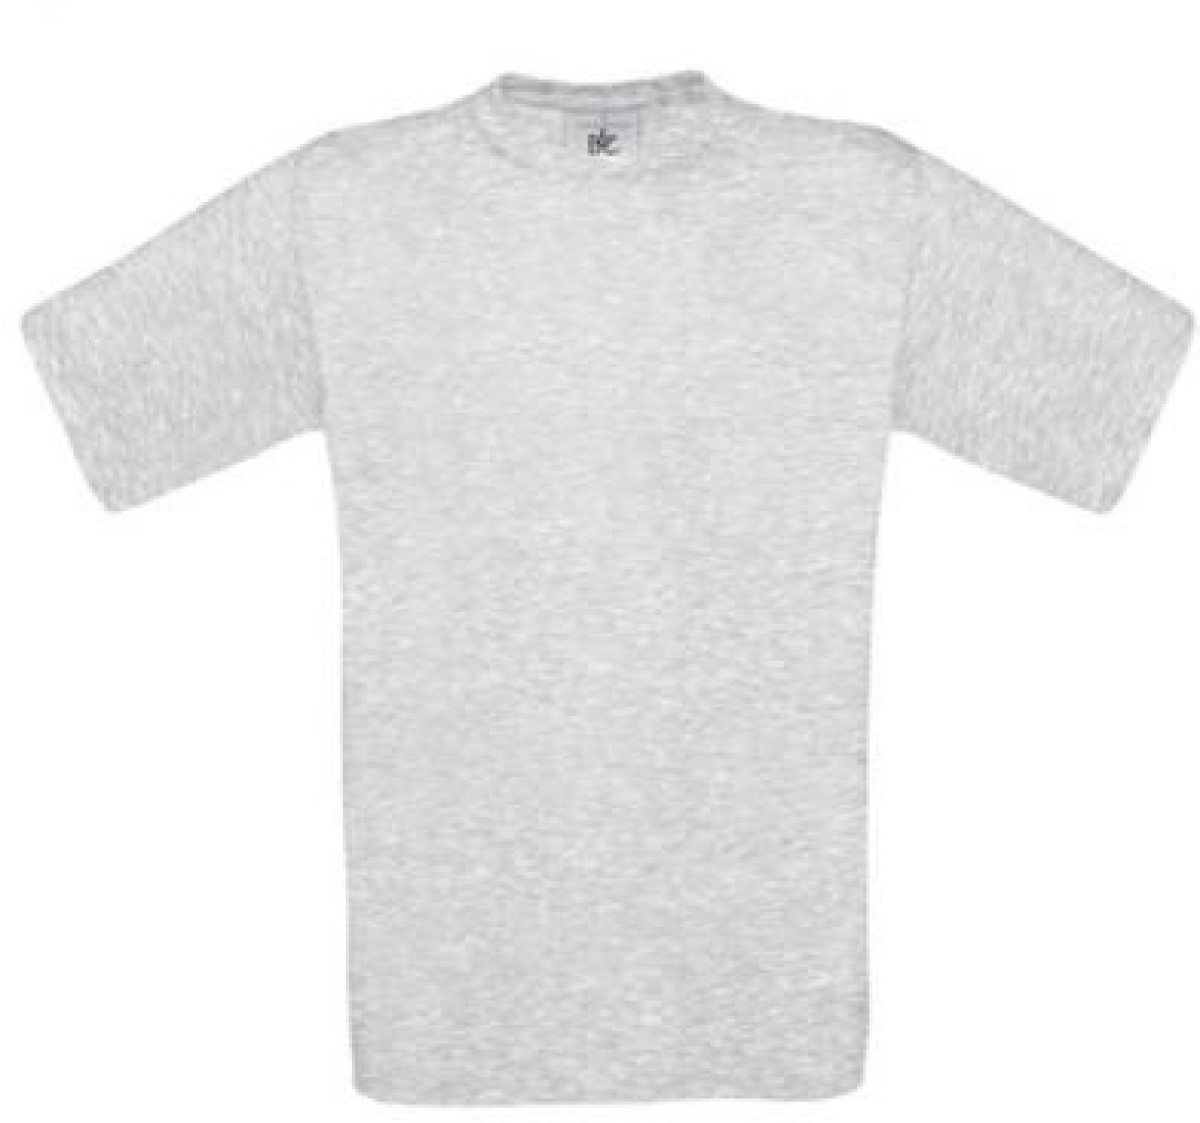 b c t shirt exact 190 mit logo bedruckt vh werbeartikel. Black Bedroom Furniture Sets. Home Design Ideas